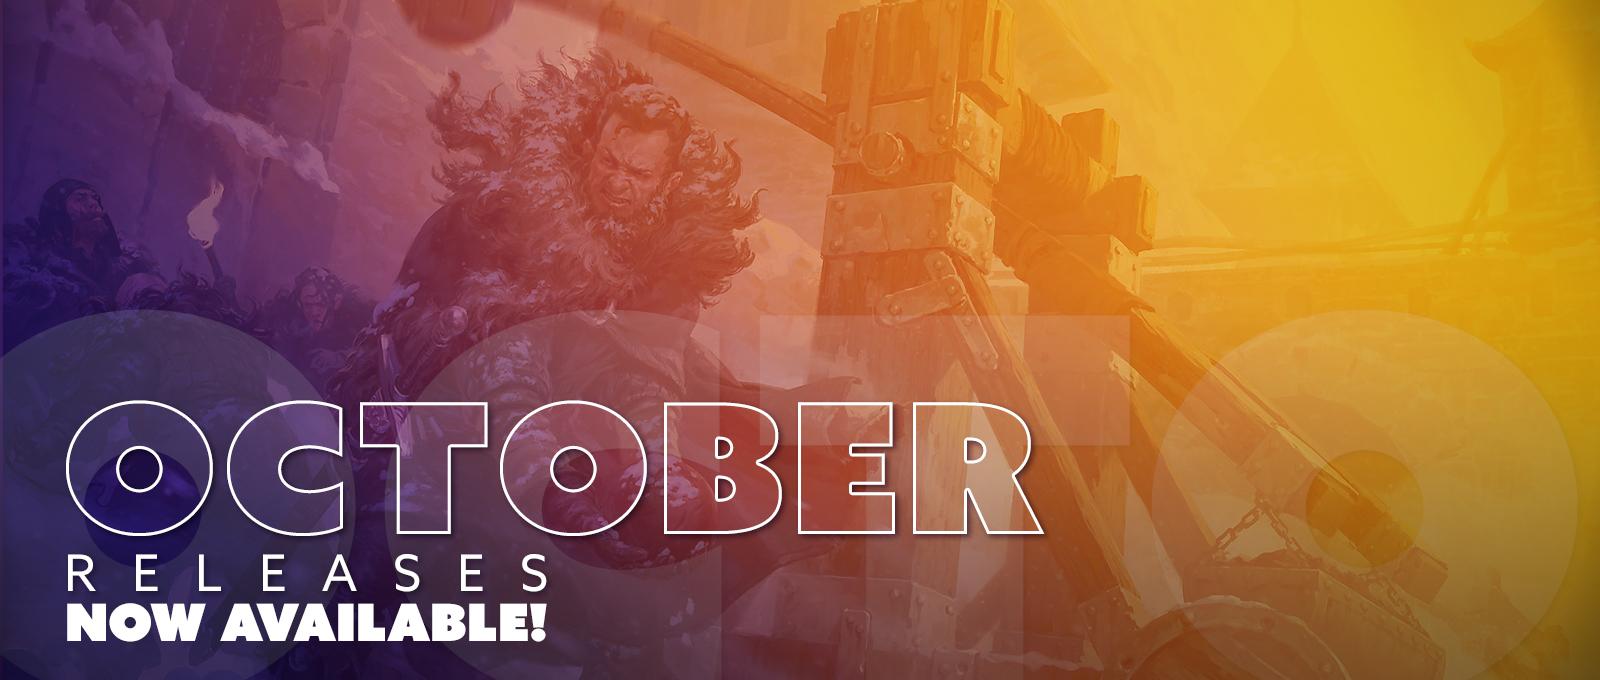 OctoberReleases_LGHero_1600x680